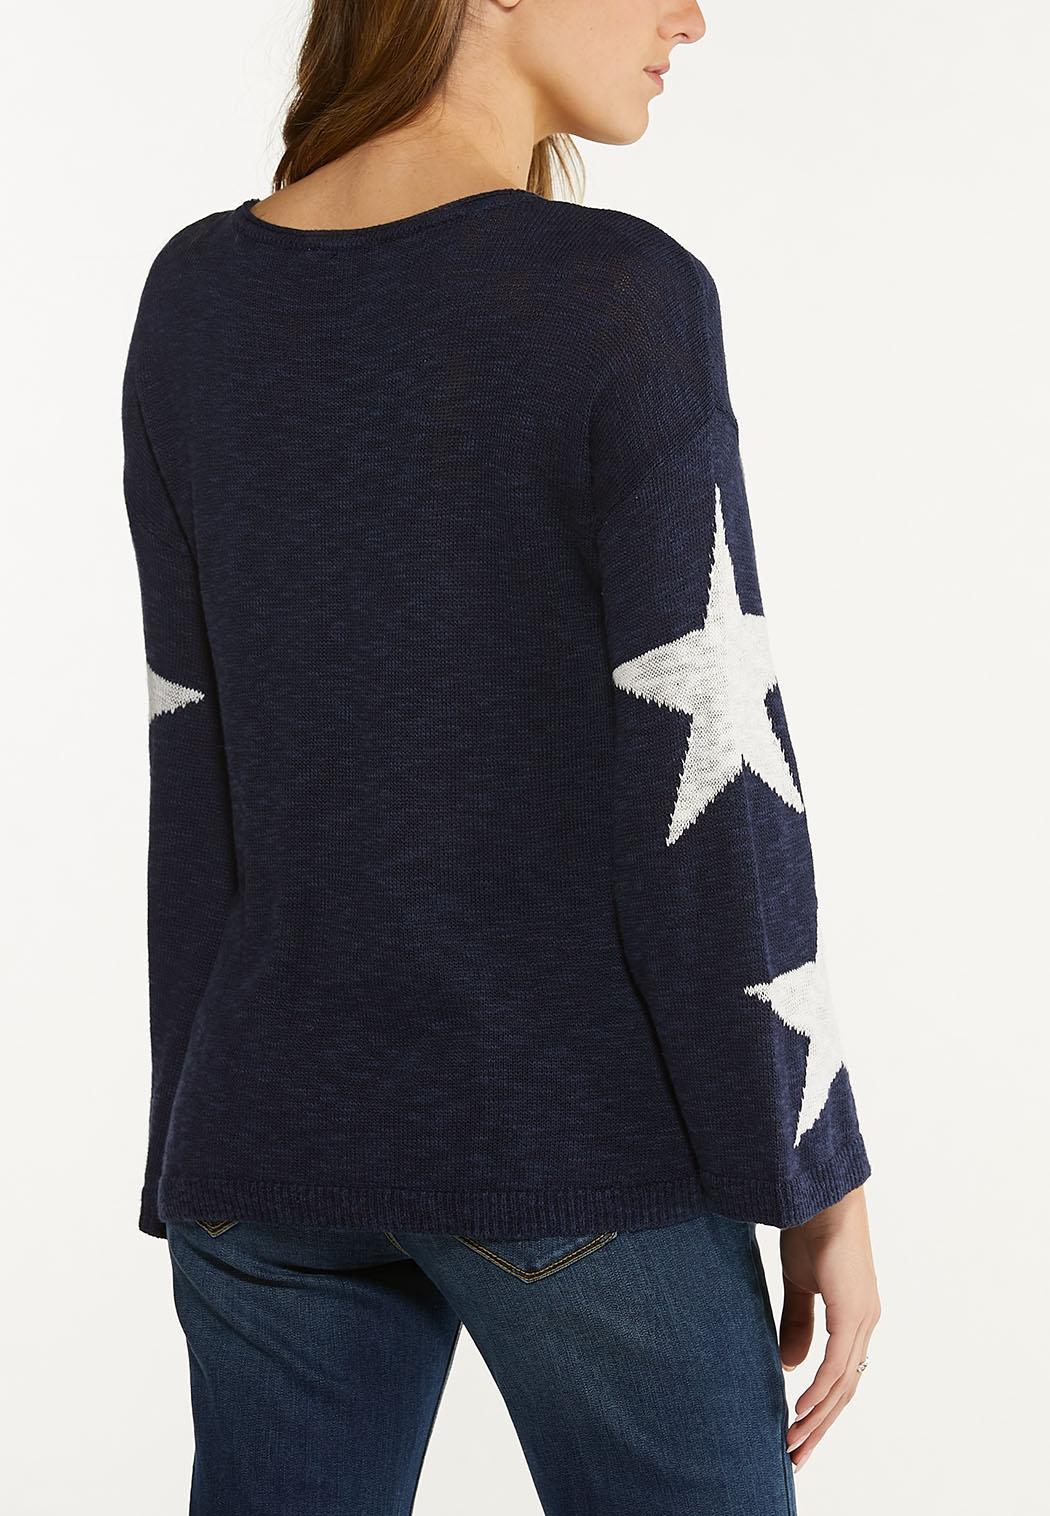 Plus Size Super Star Sweater (Item #44580172)